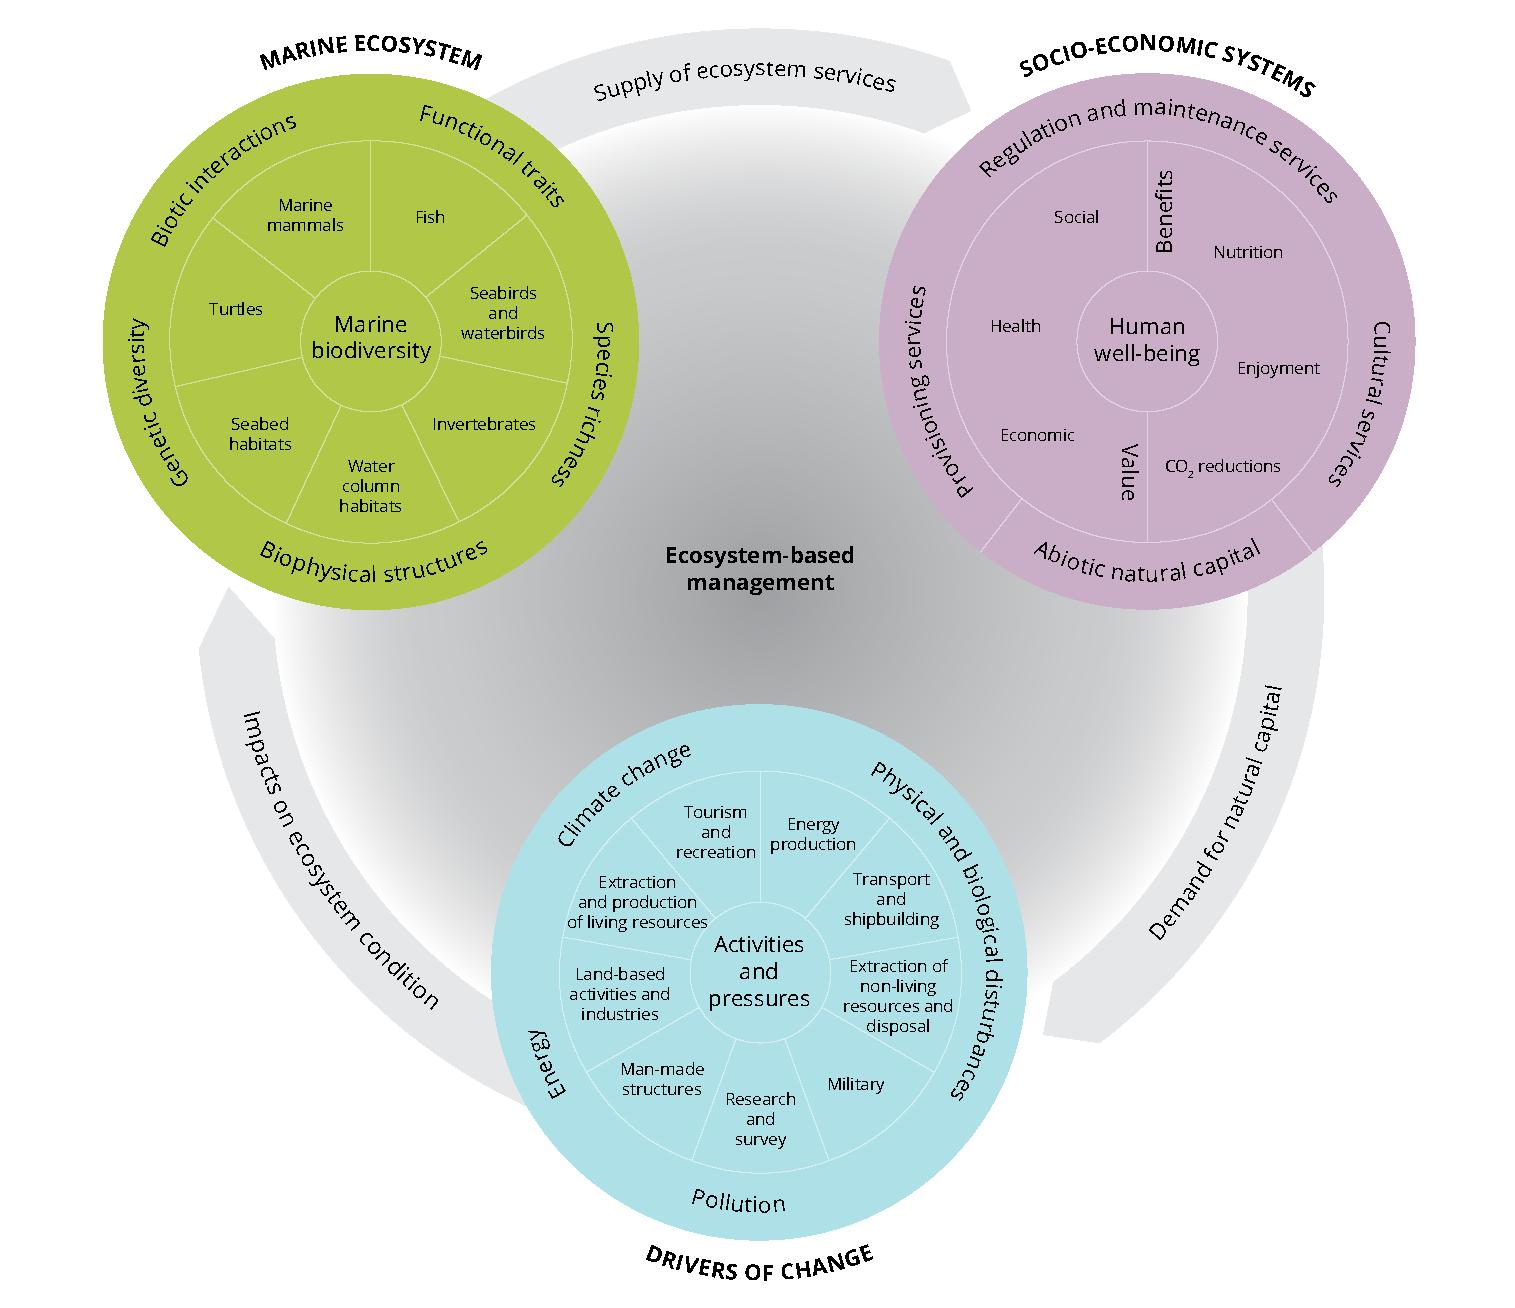 Ecosystem-based assessment